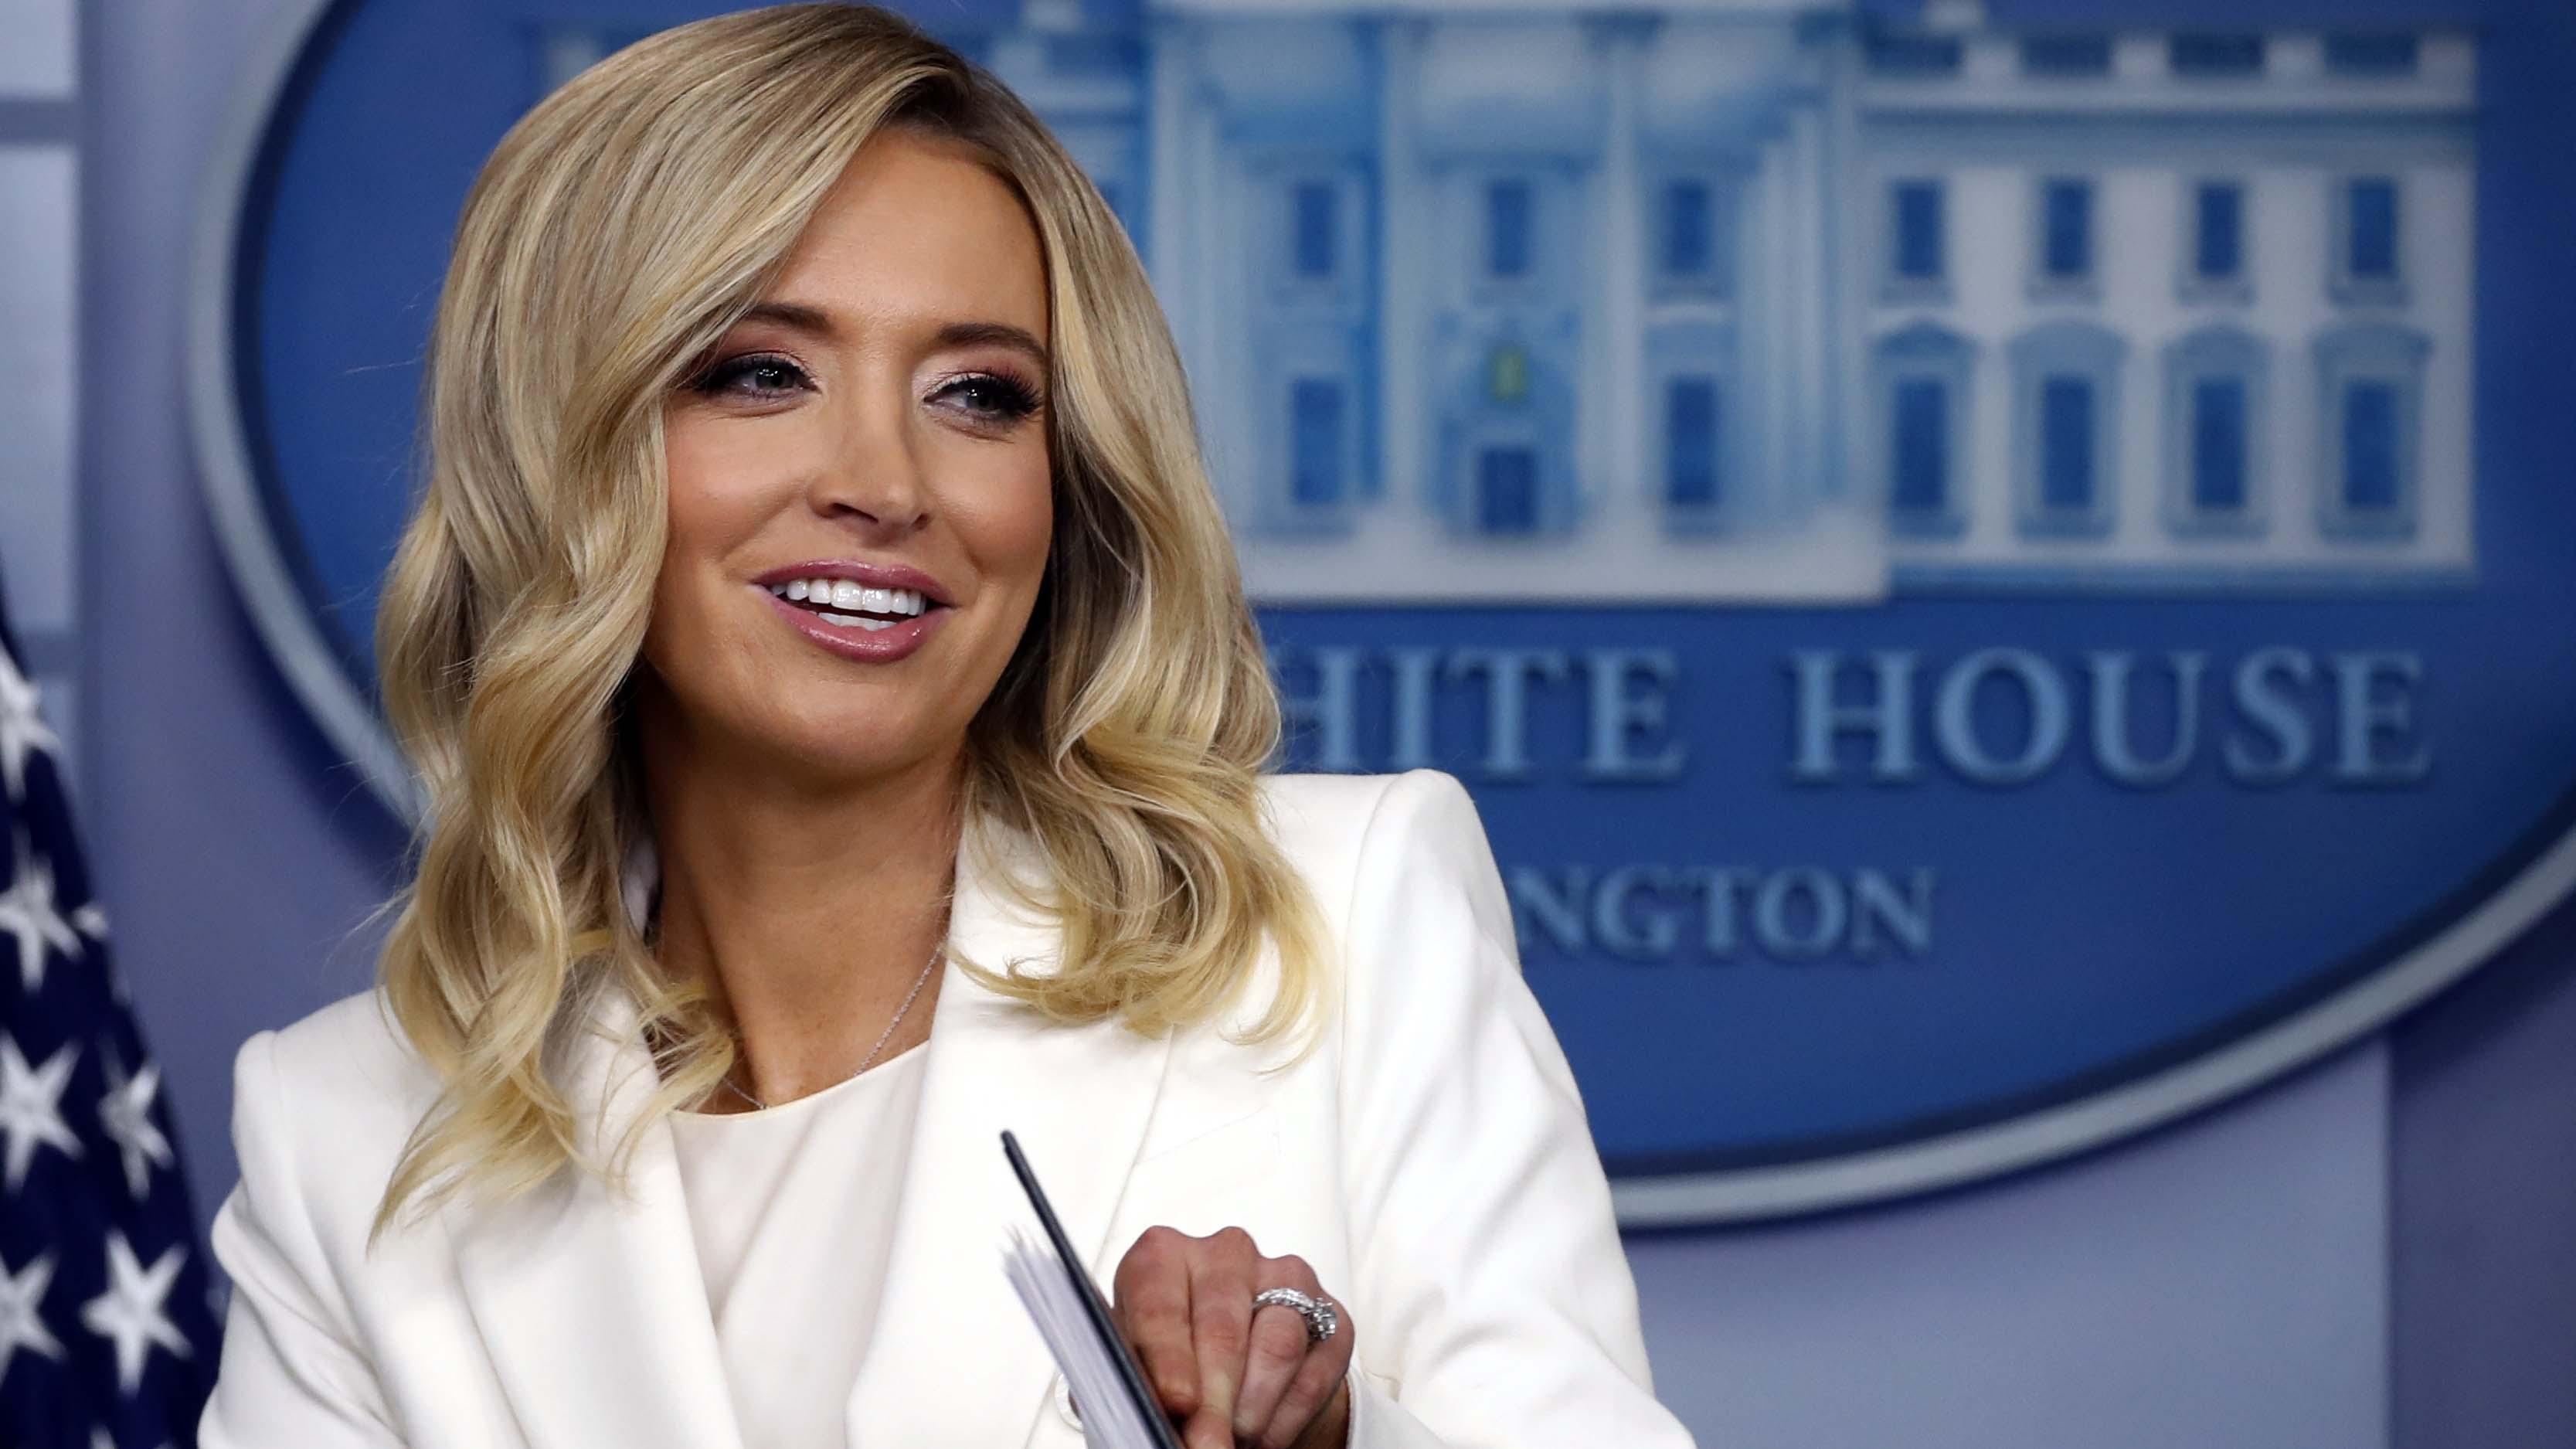 Kayleigh Mcenany The Latest Fox Star In The White House Cgtn